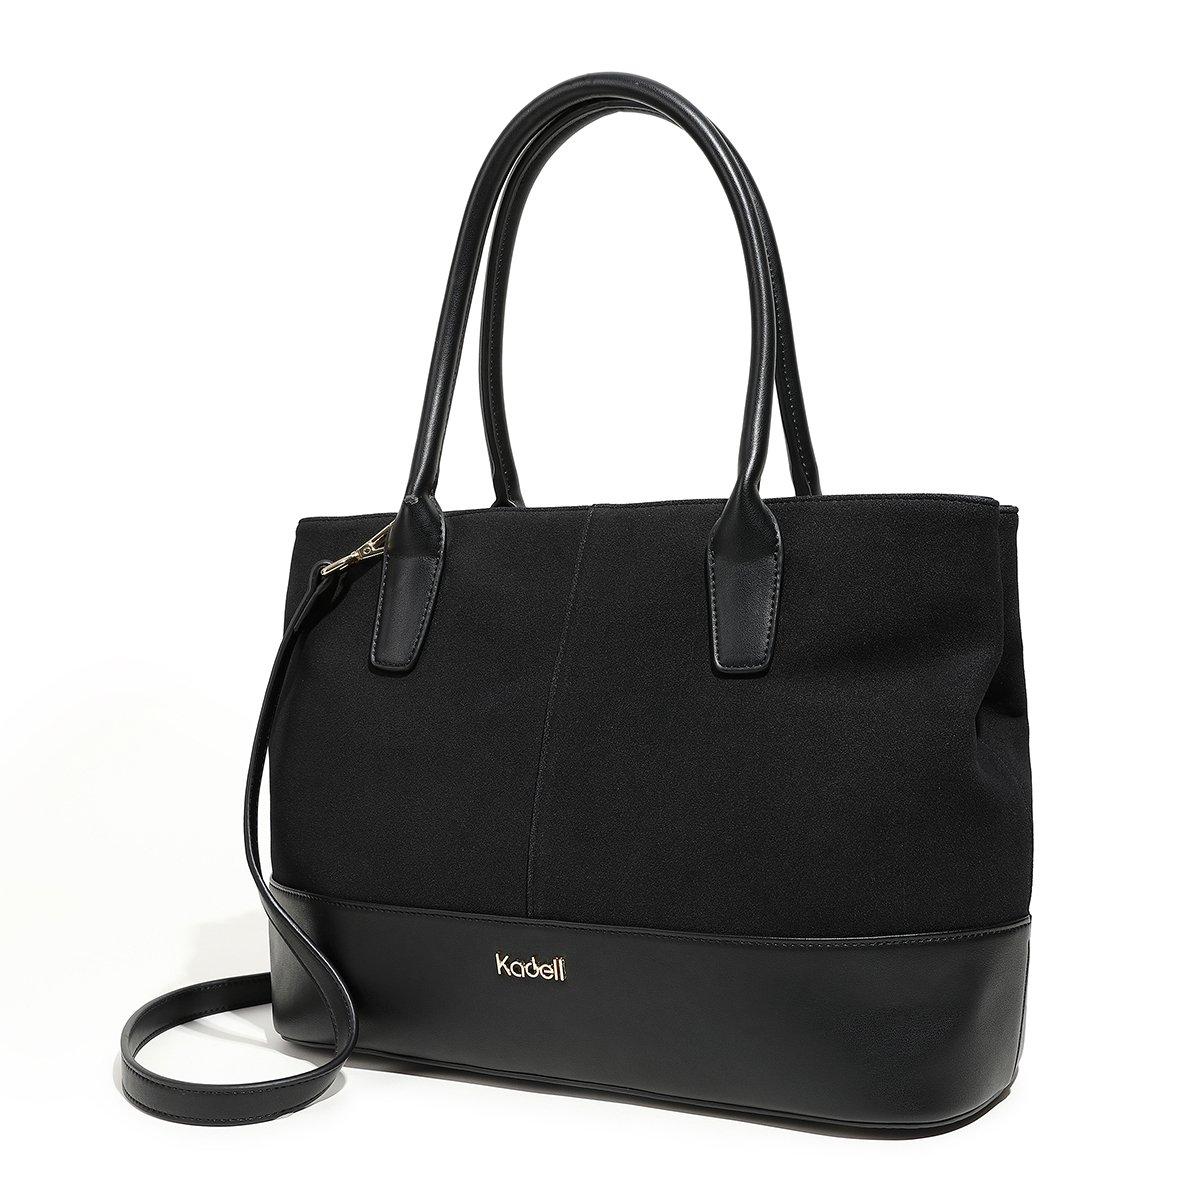 f7b50e0c117a Kadell Women s Handbag PU Leather Tote Bag Shoulder Satchel Purse for Ladies  Black  Handbags  Amazon.com